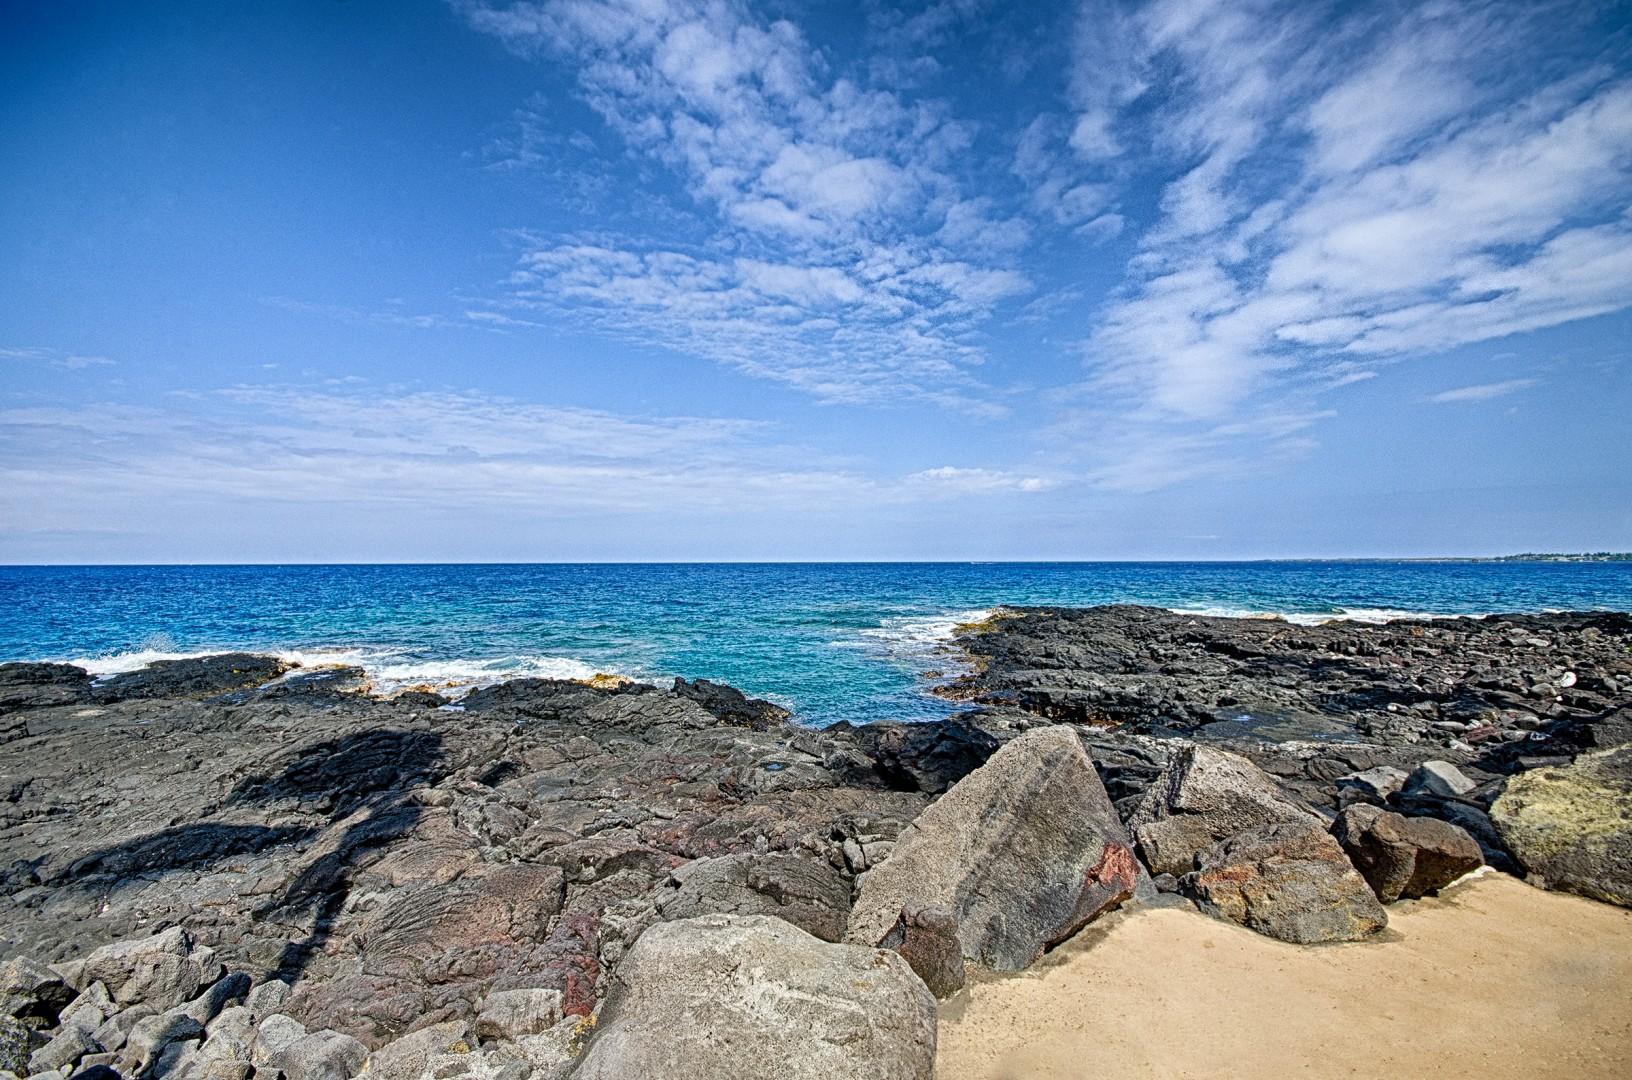 Rocky ocean entrance